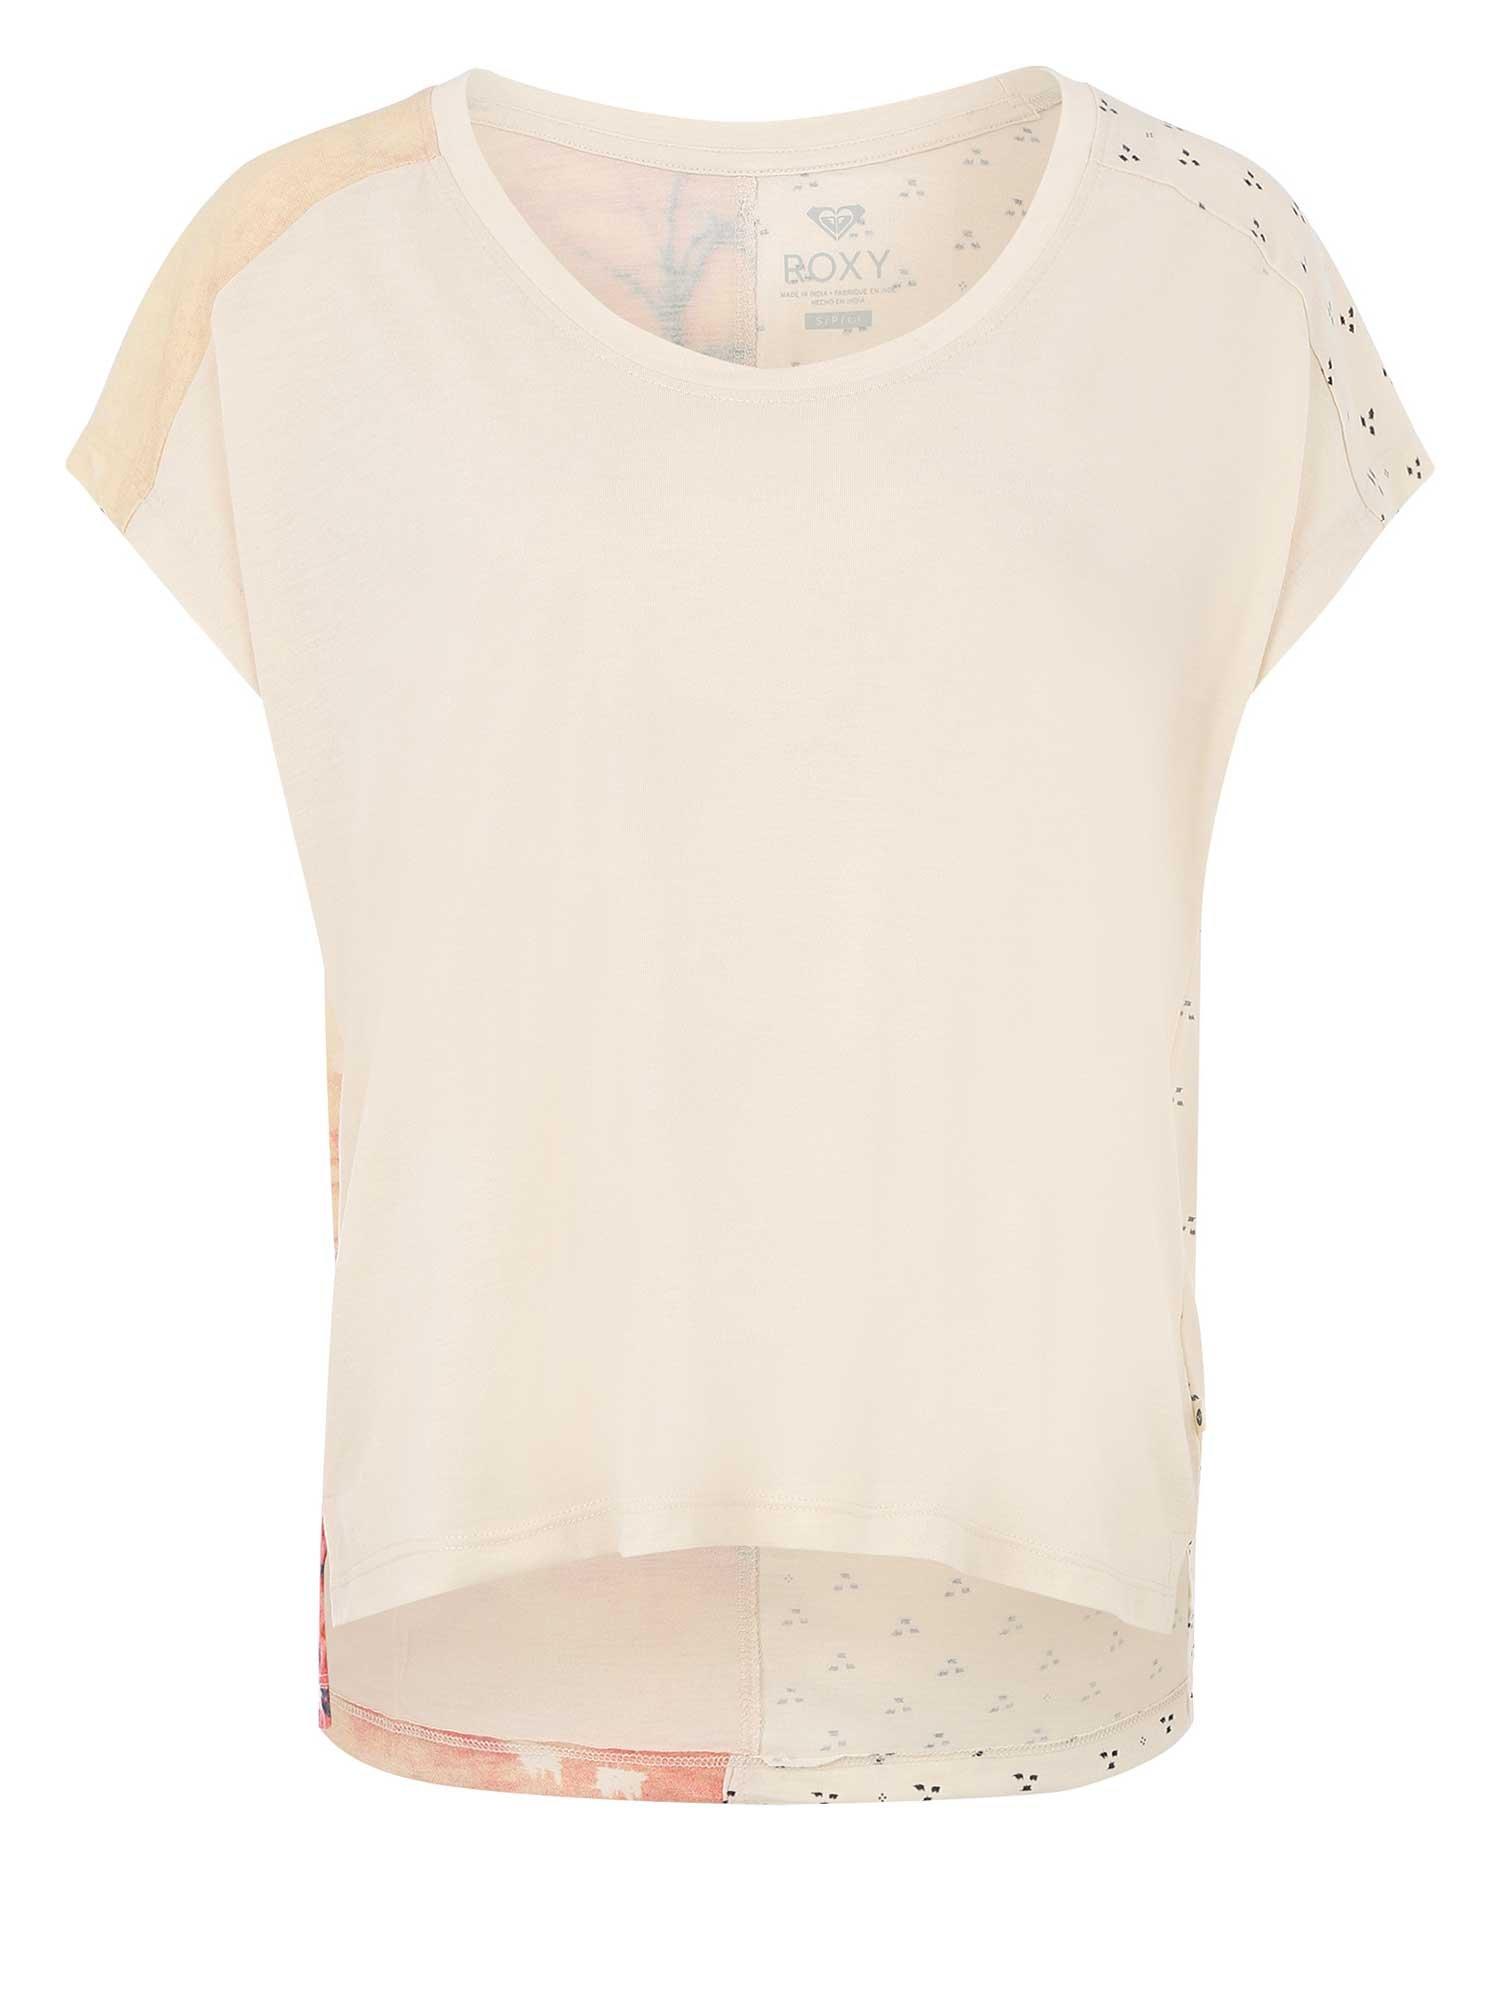 Roxy Dolman Lake Bliss – Camiseta para Mujer ERJZT03568